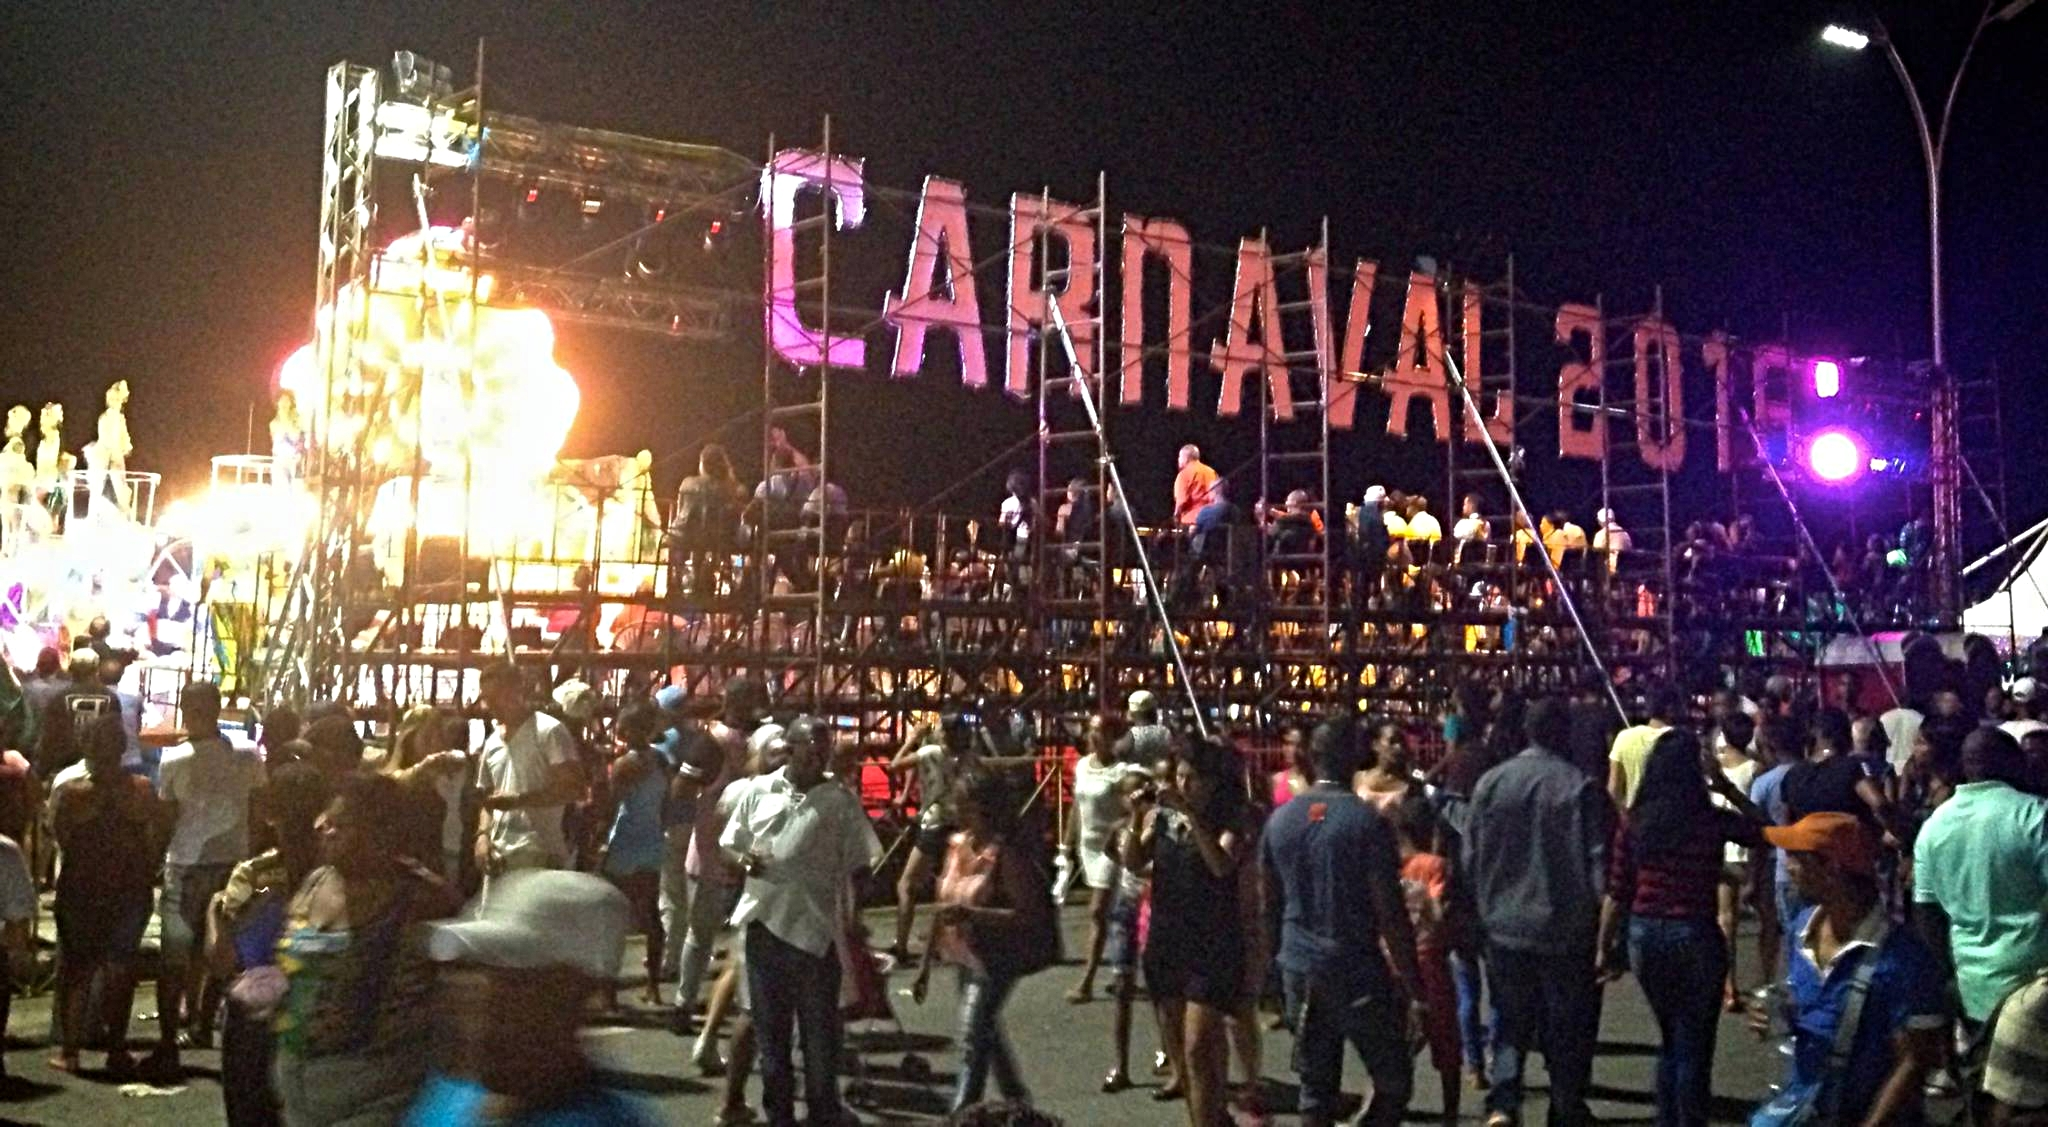 Havana Carnivale